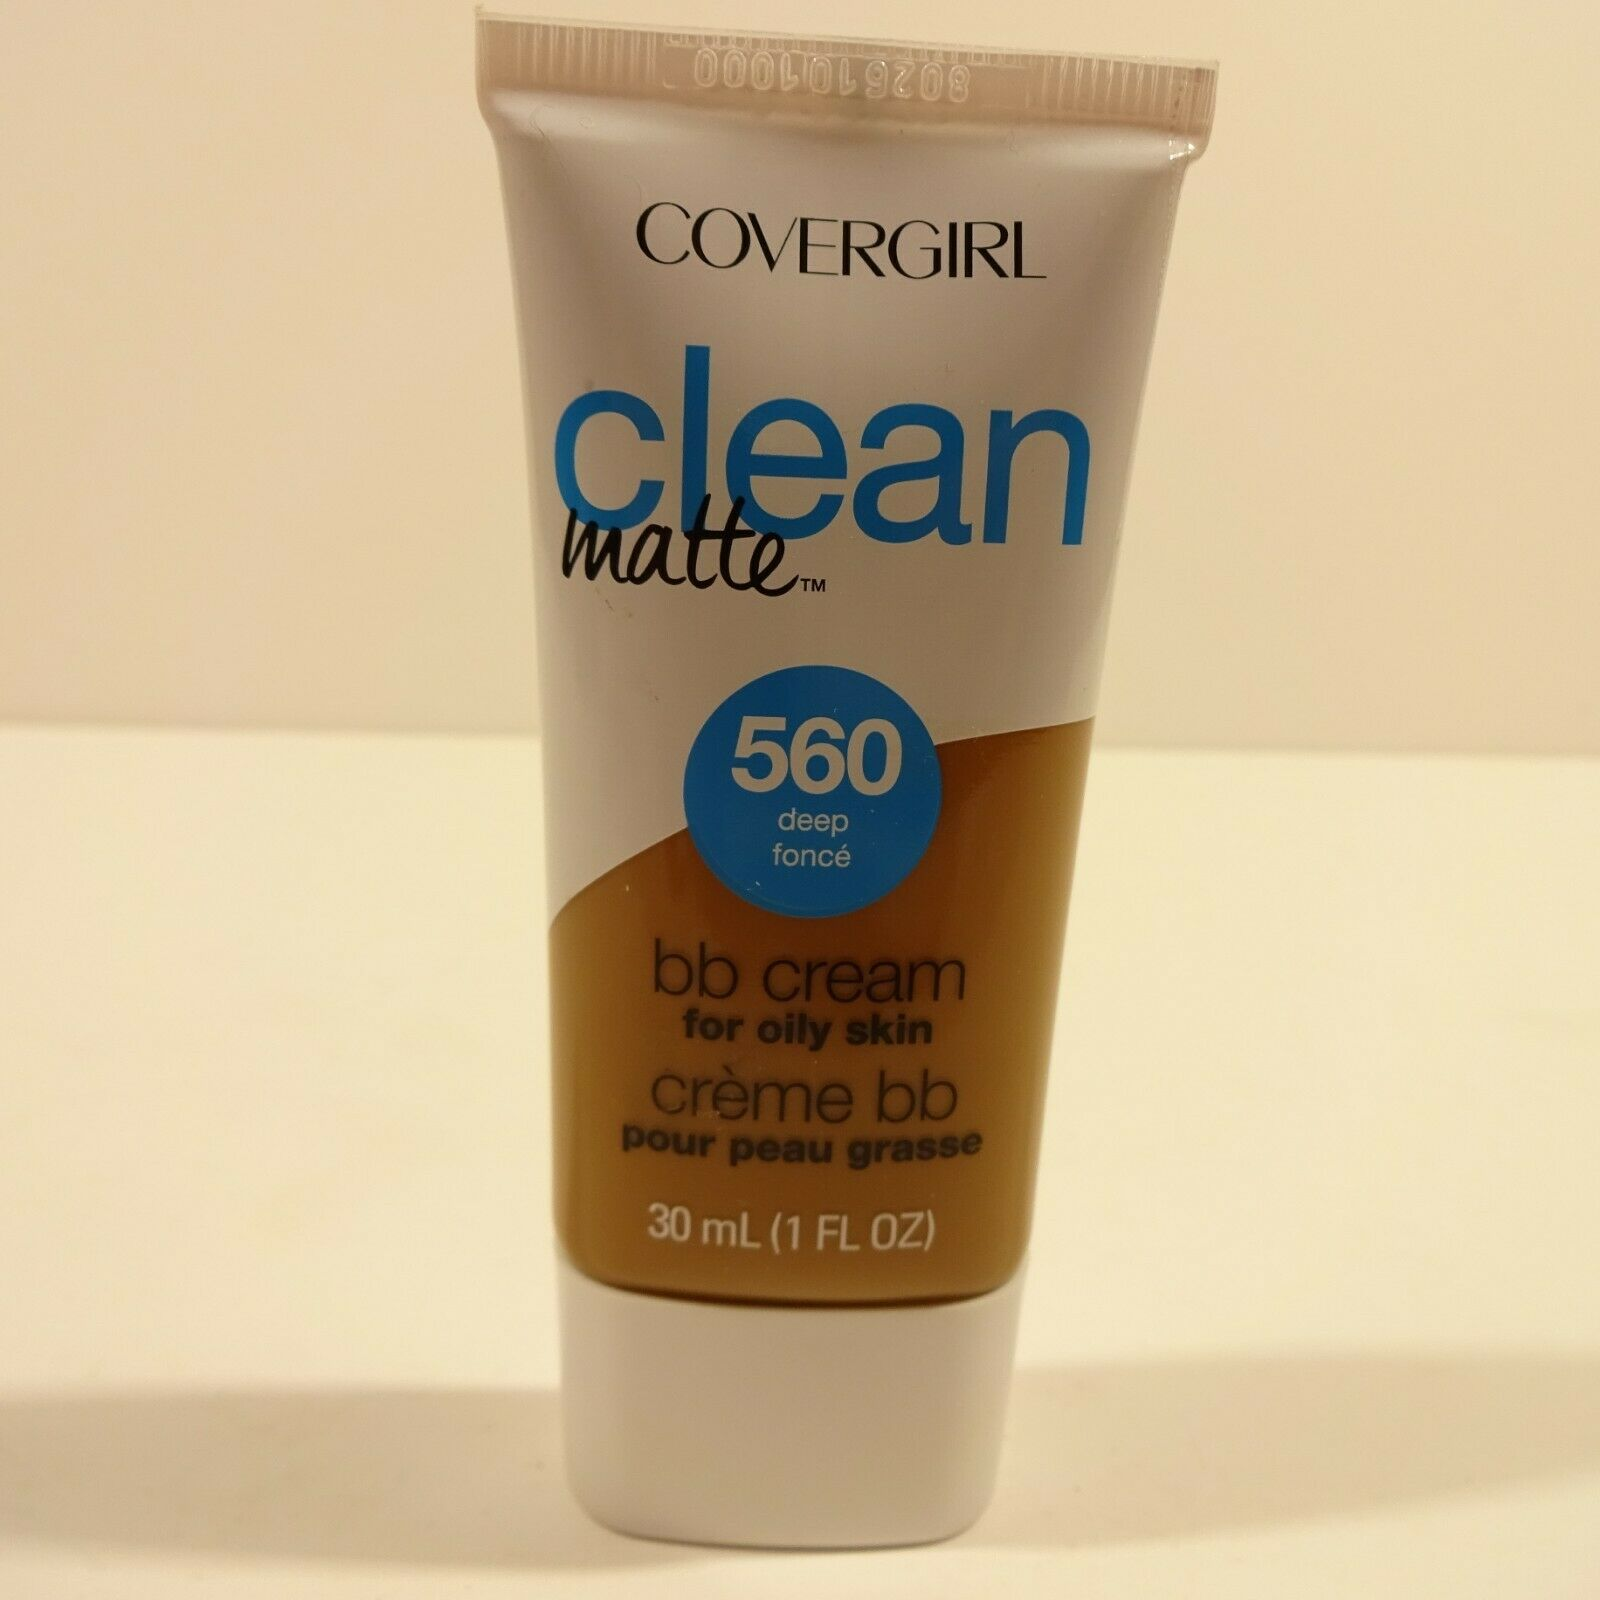 COVERGIRL Clean Matte BB Cream Deep 560 For Oily Skin, 1 oz